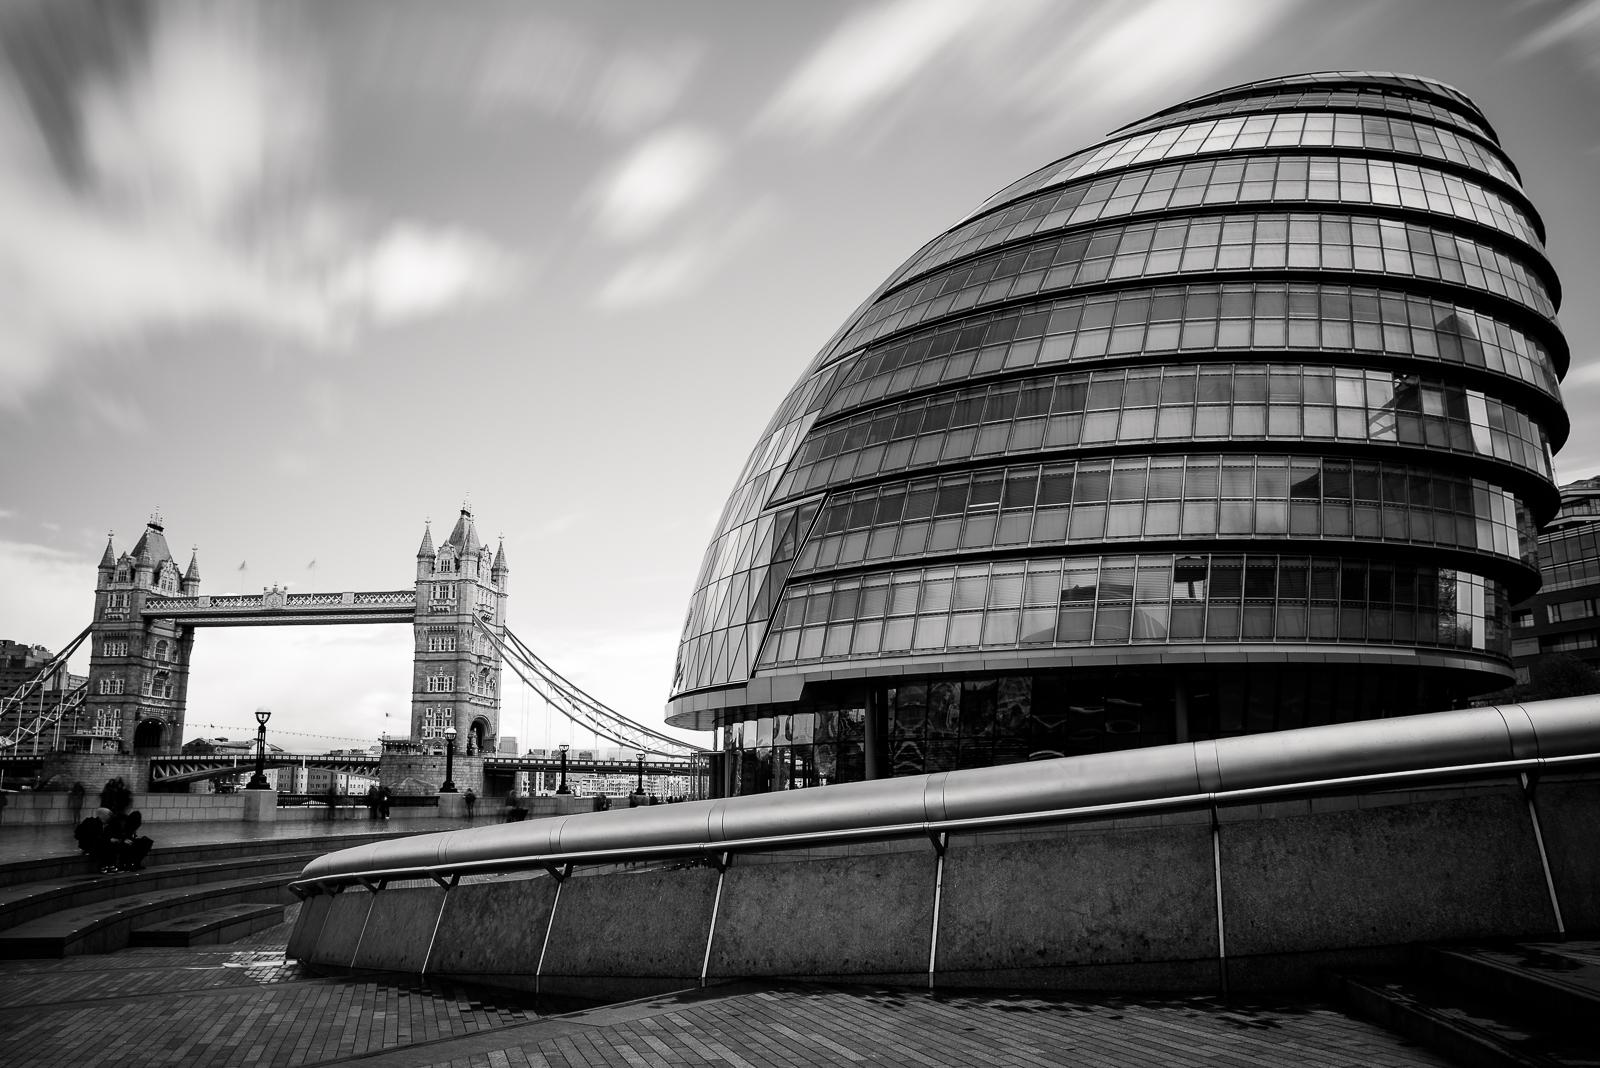 City Hall, London - United Kingdom